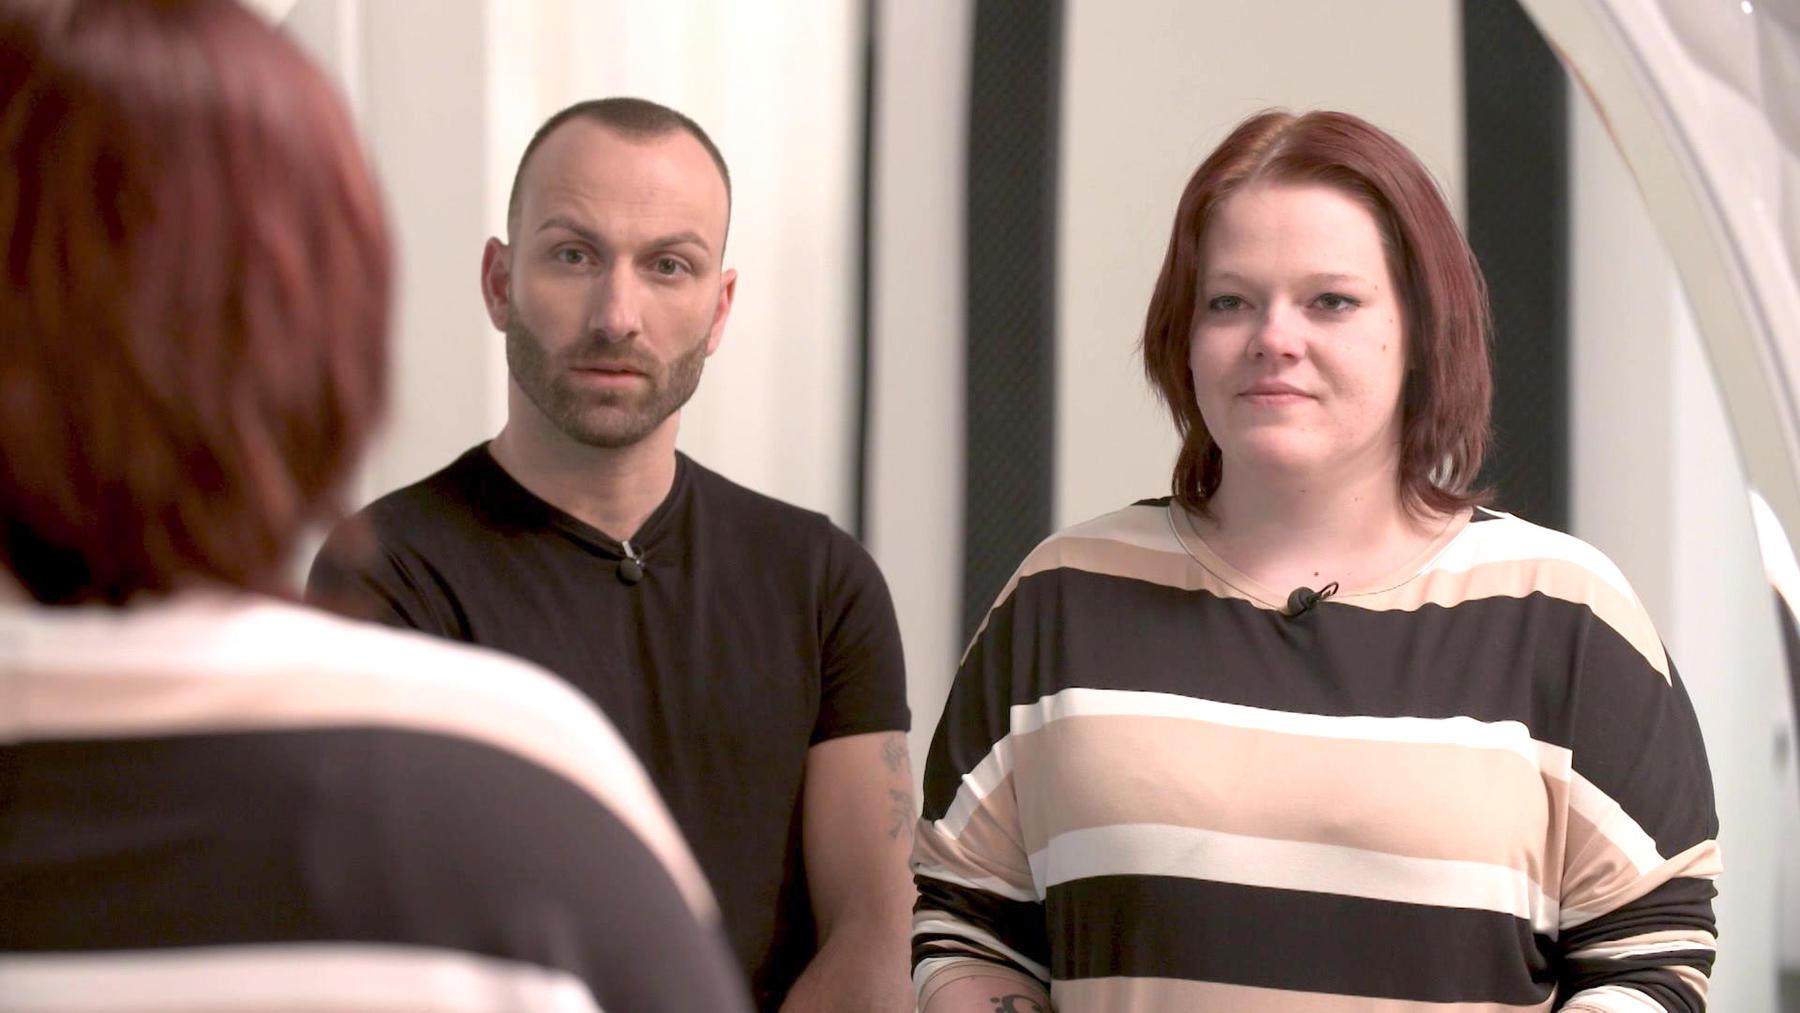 Julia (Haarausfall) & Niccole (Augenringe)